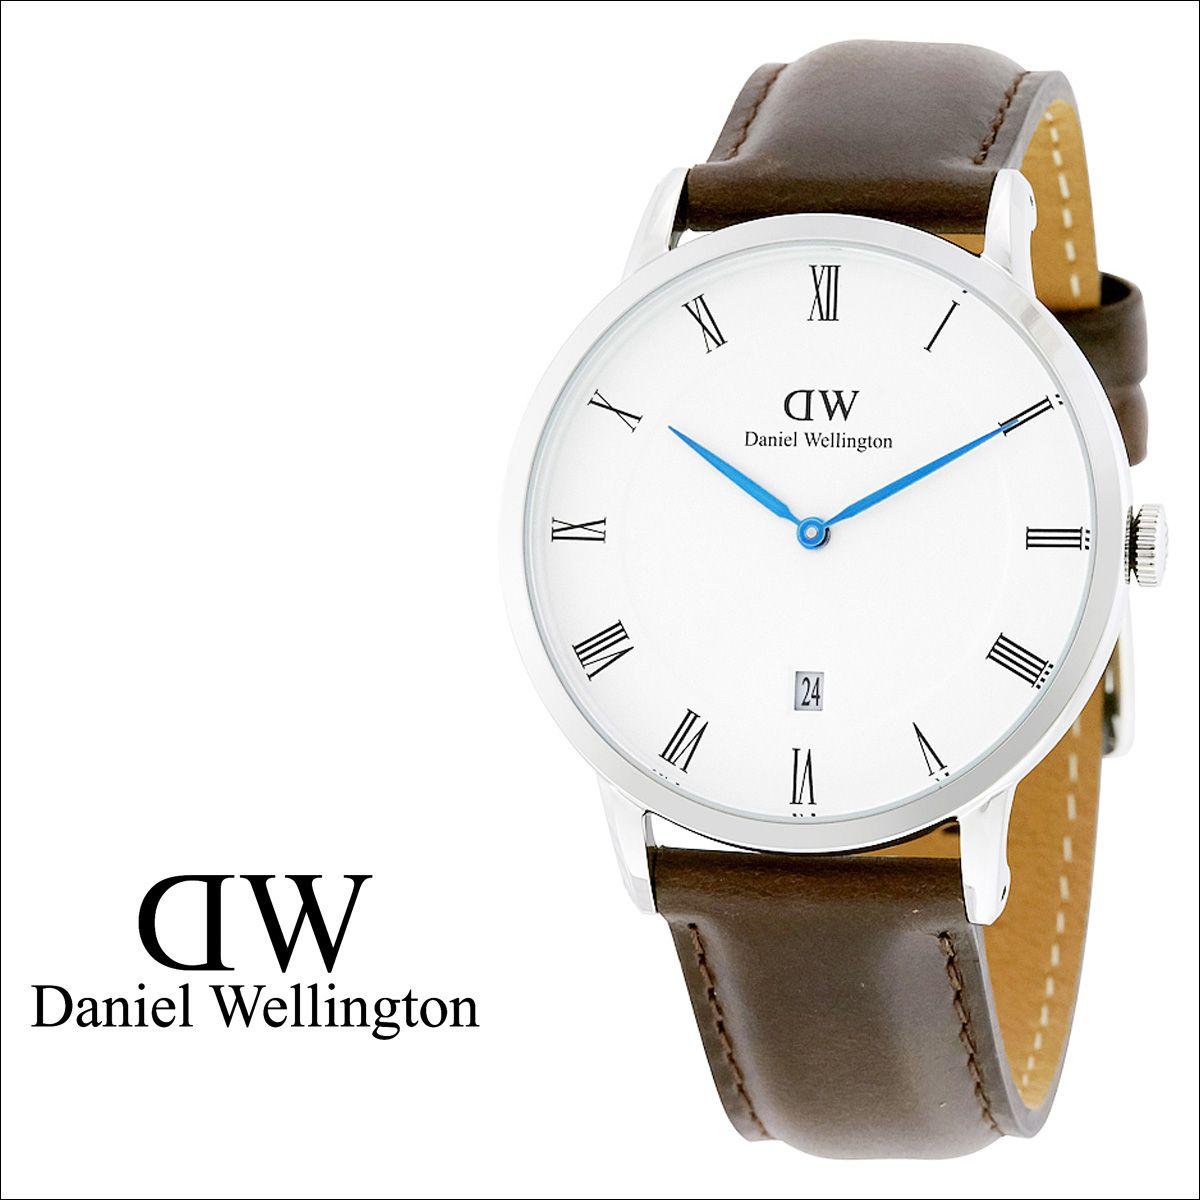 d2938f2cd7648 Daniel Wellington Daniel Wellington men s watch watches watch 38 mm 1123 DW DAPPER  BRISTOL silver  10 28…